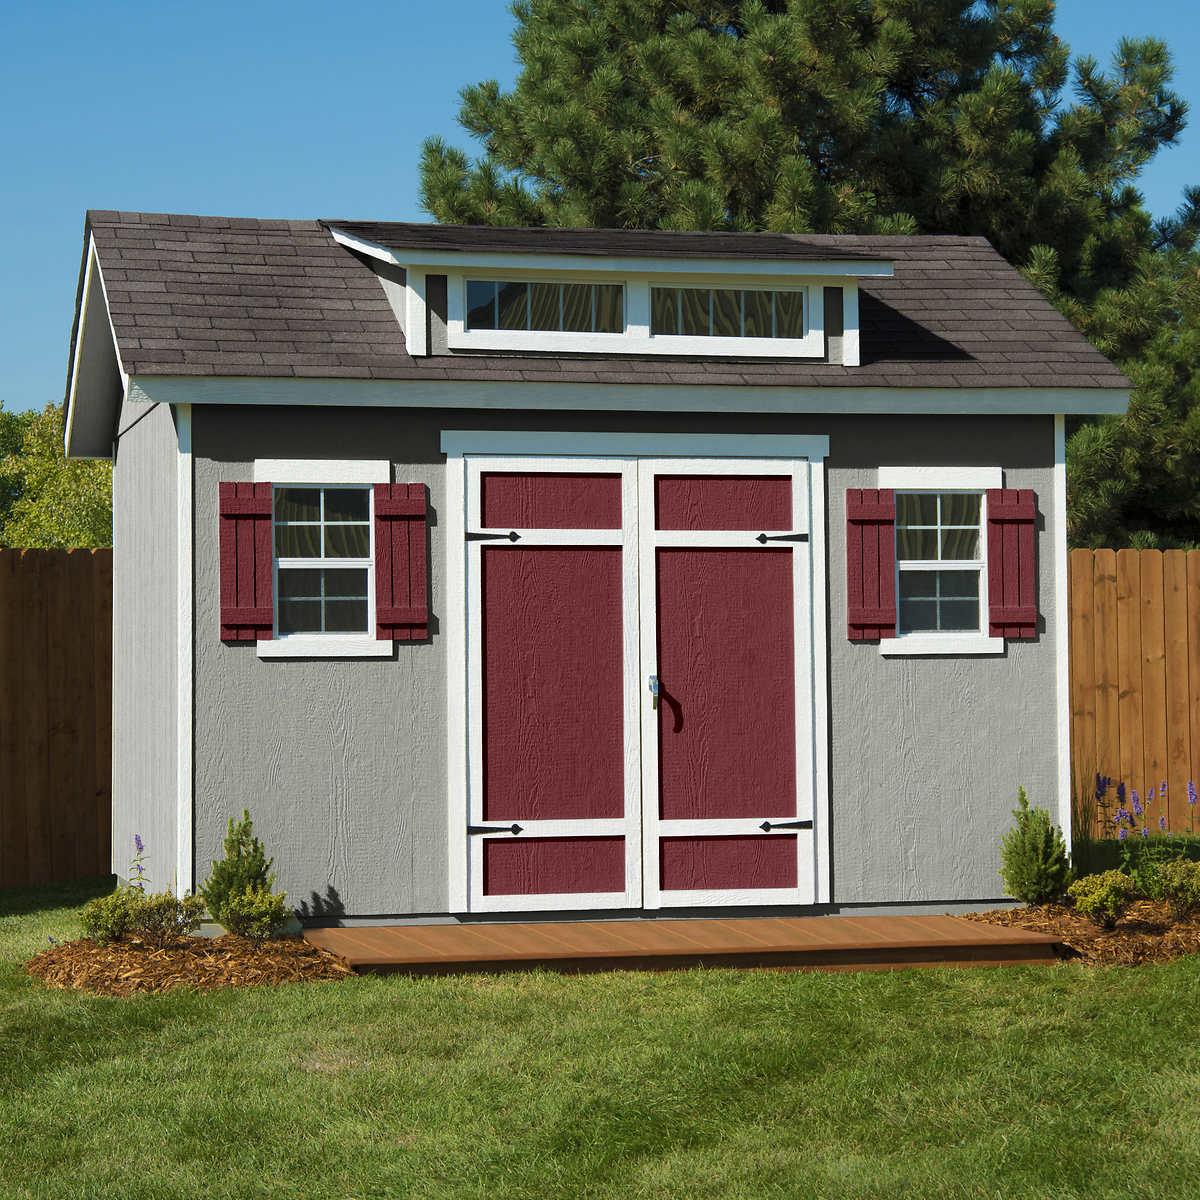 Garden Sheds 12 X 12 stonecroft 12' x 10' wood storage shed